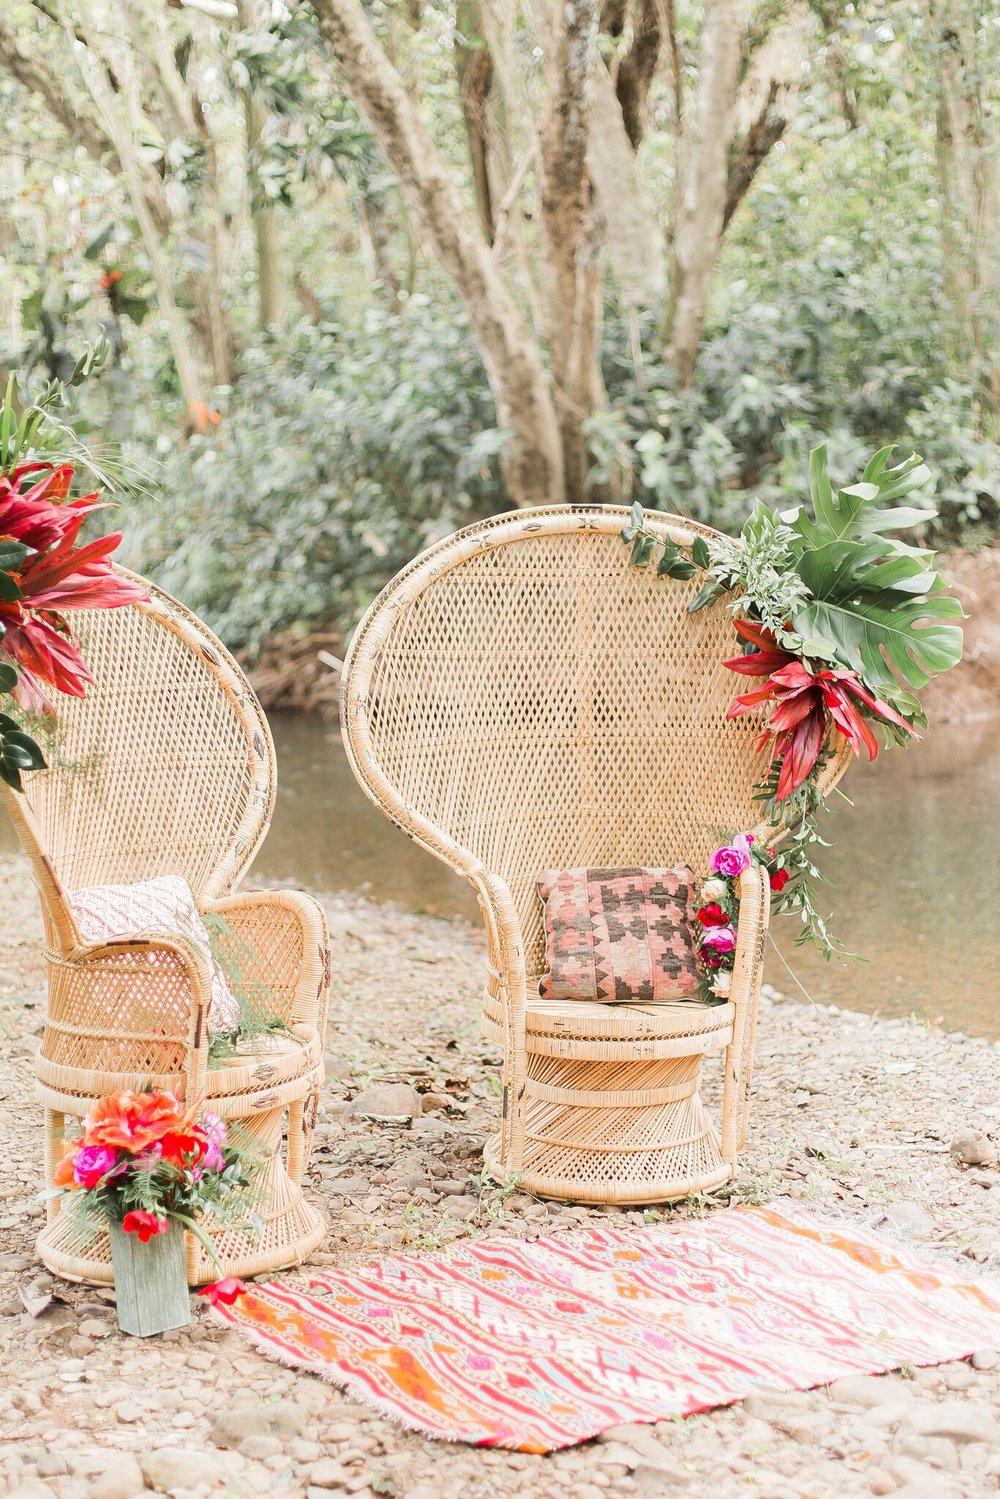 King Kamehameha Chair  photo by Betty Globa